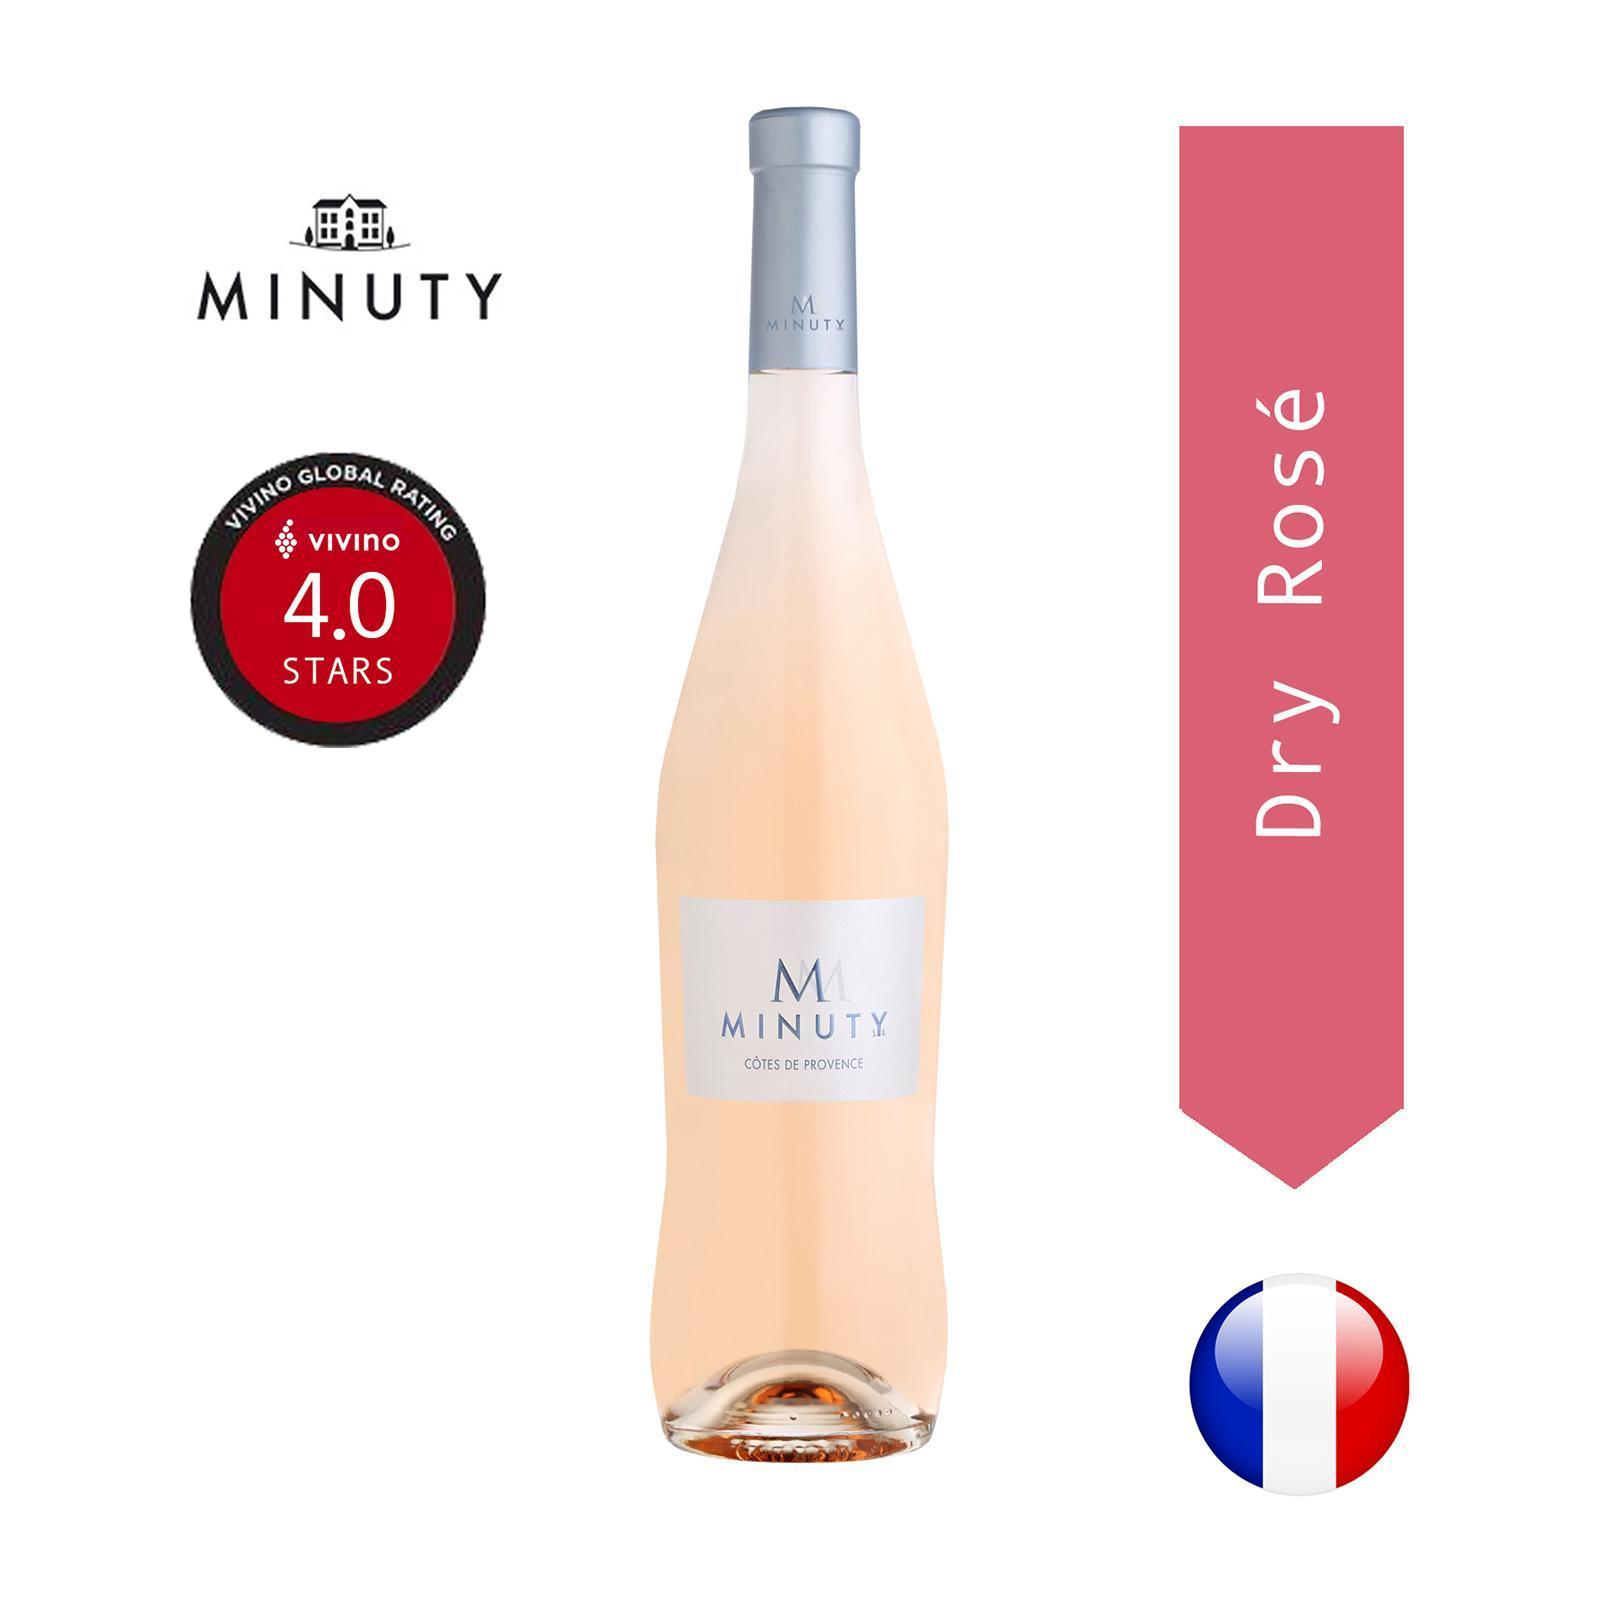 M de Minuty - Cotes de Provence - Rose Wine